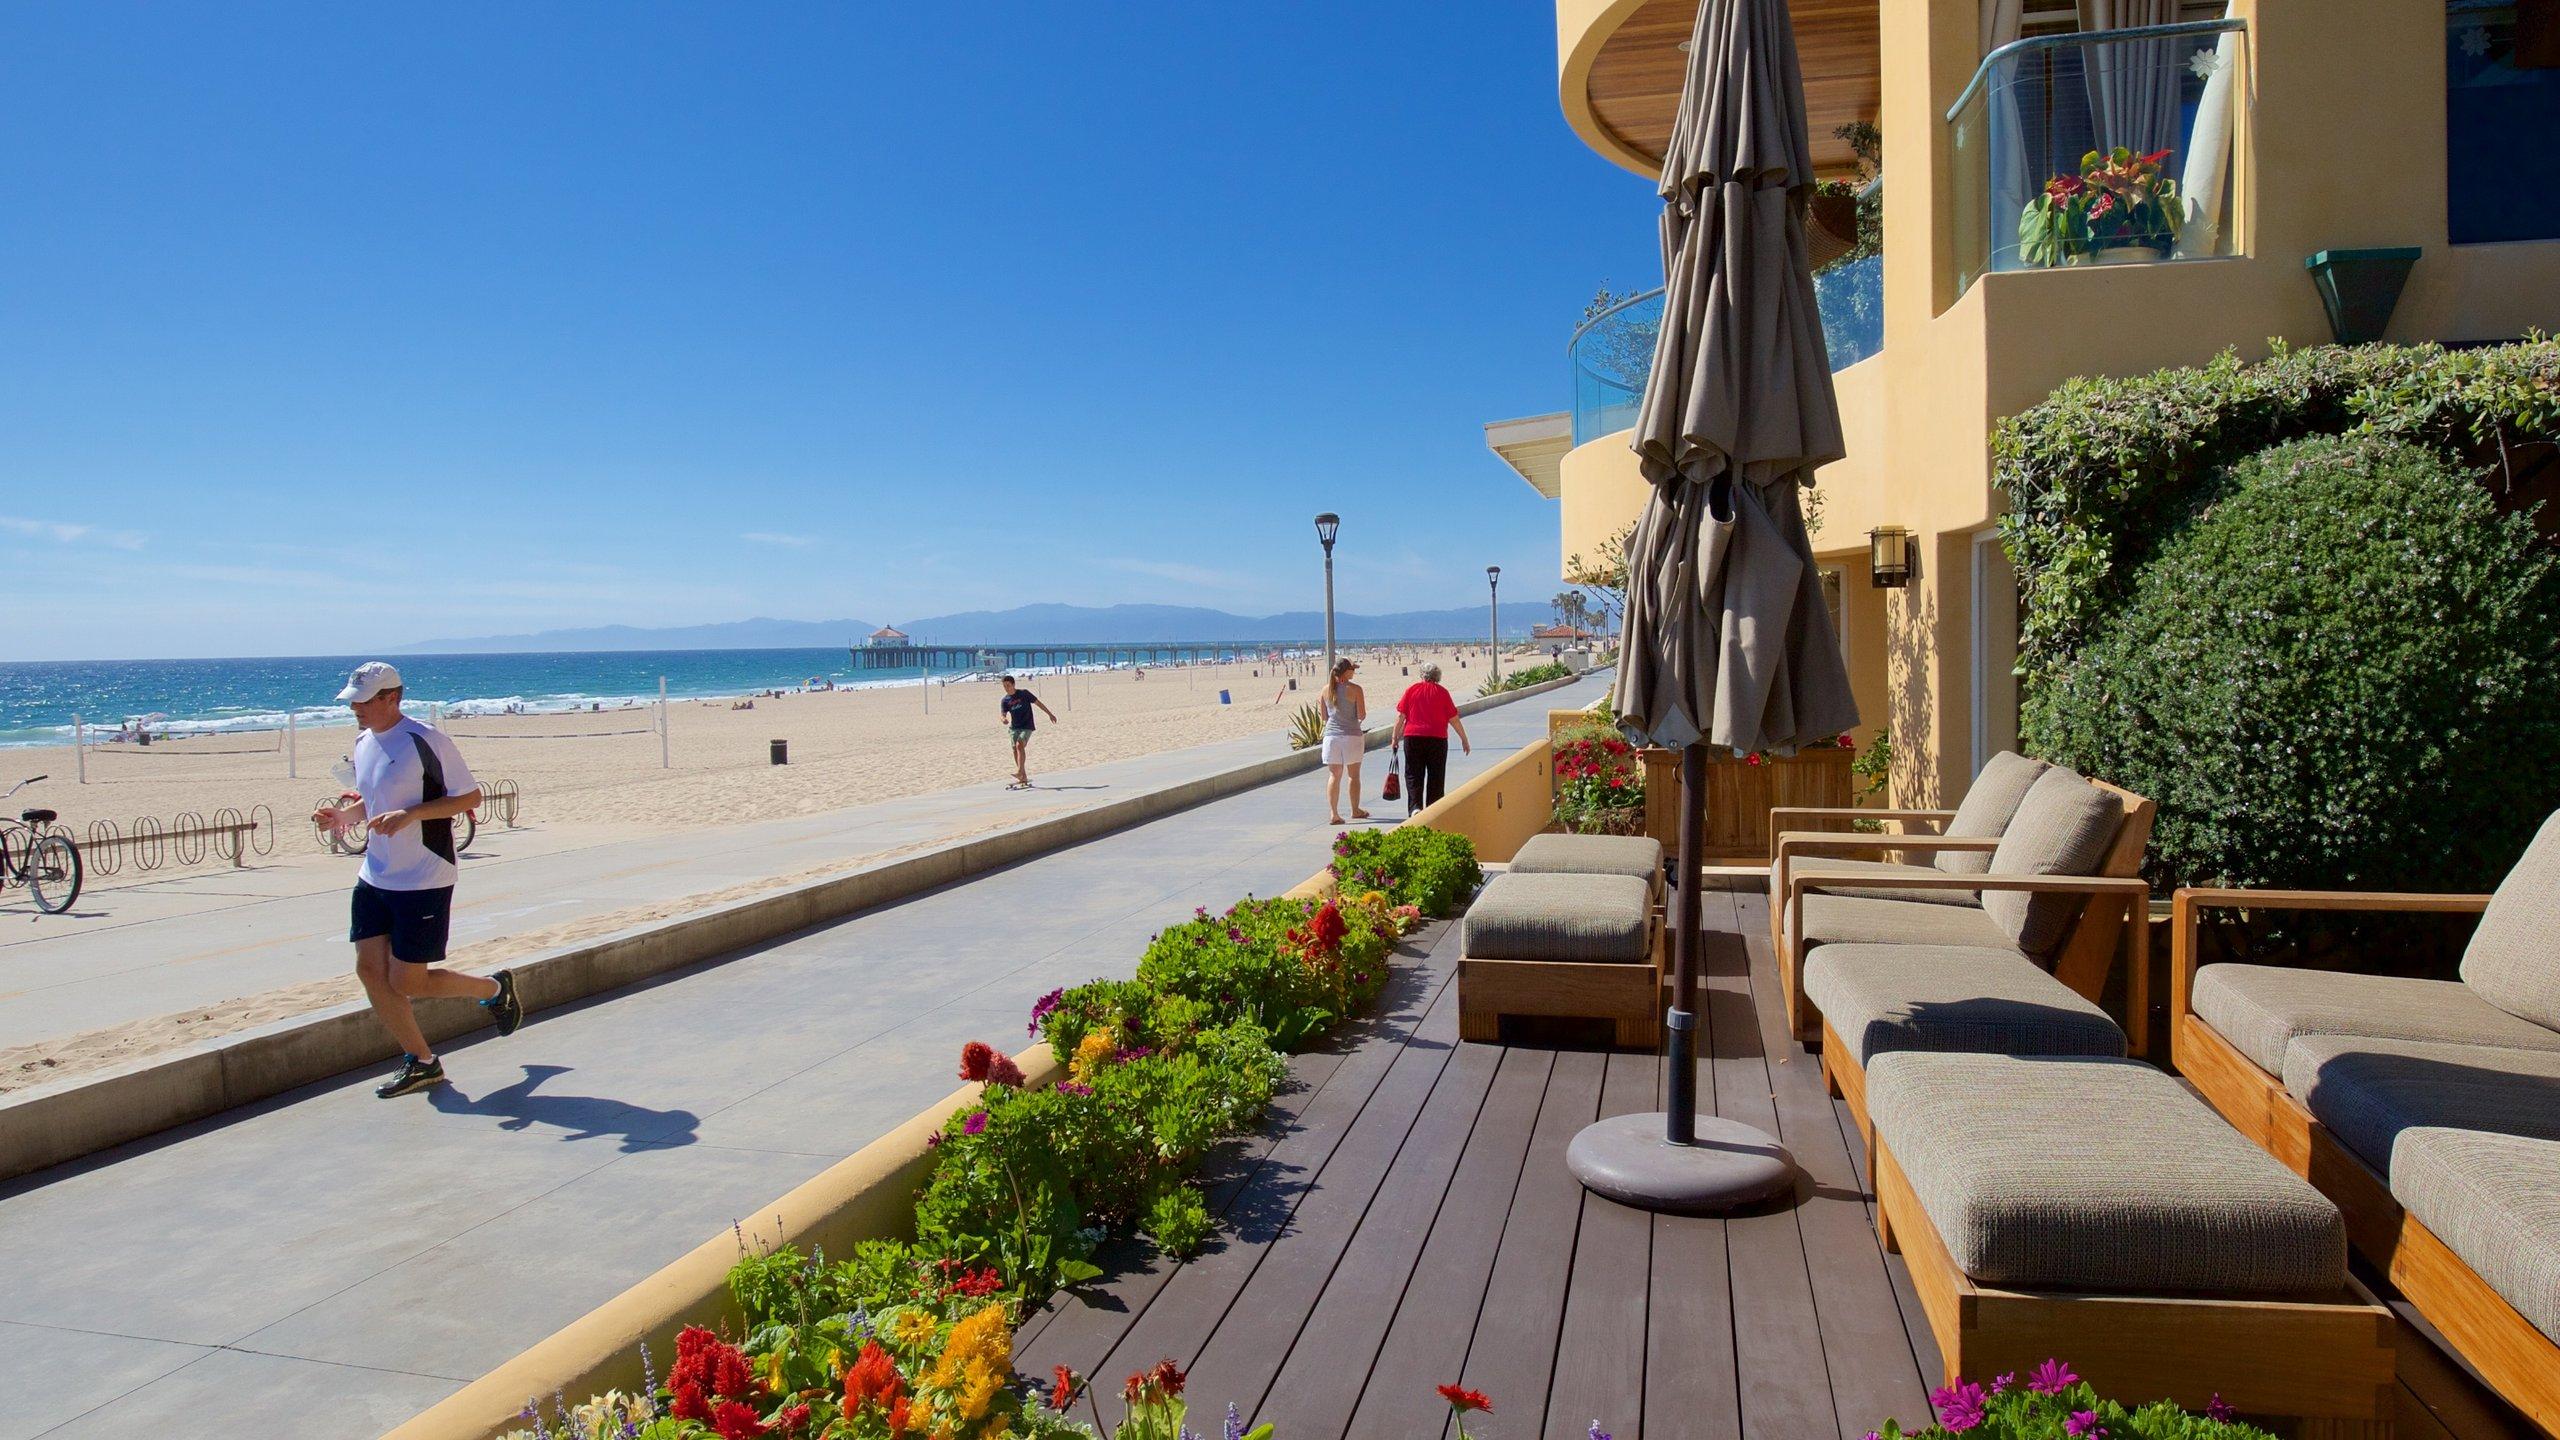 Manhattan Beach, California, United States of America